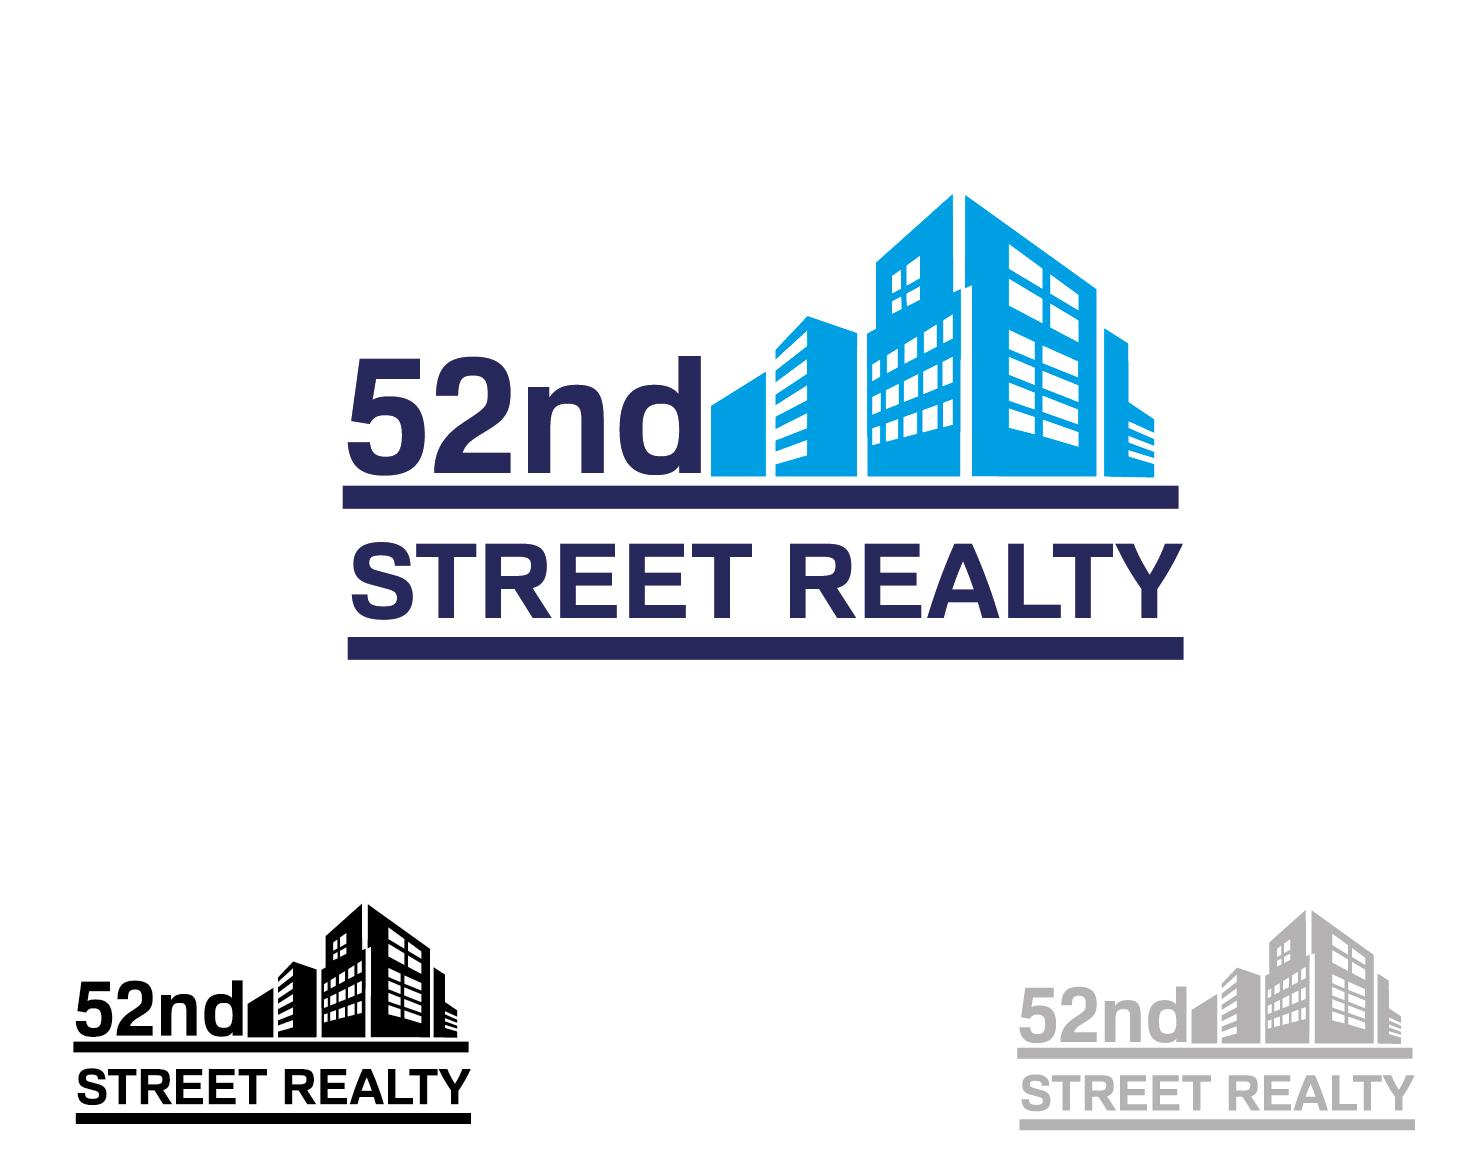 Logo Design by VENTSISLAV KOVACHEV - Entry No. 41 in the Logo Design Contest 52nd Street Realty Logo Design.